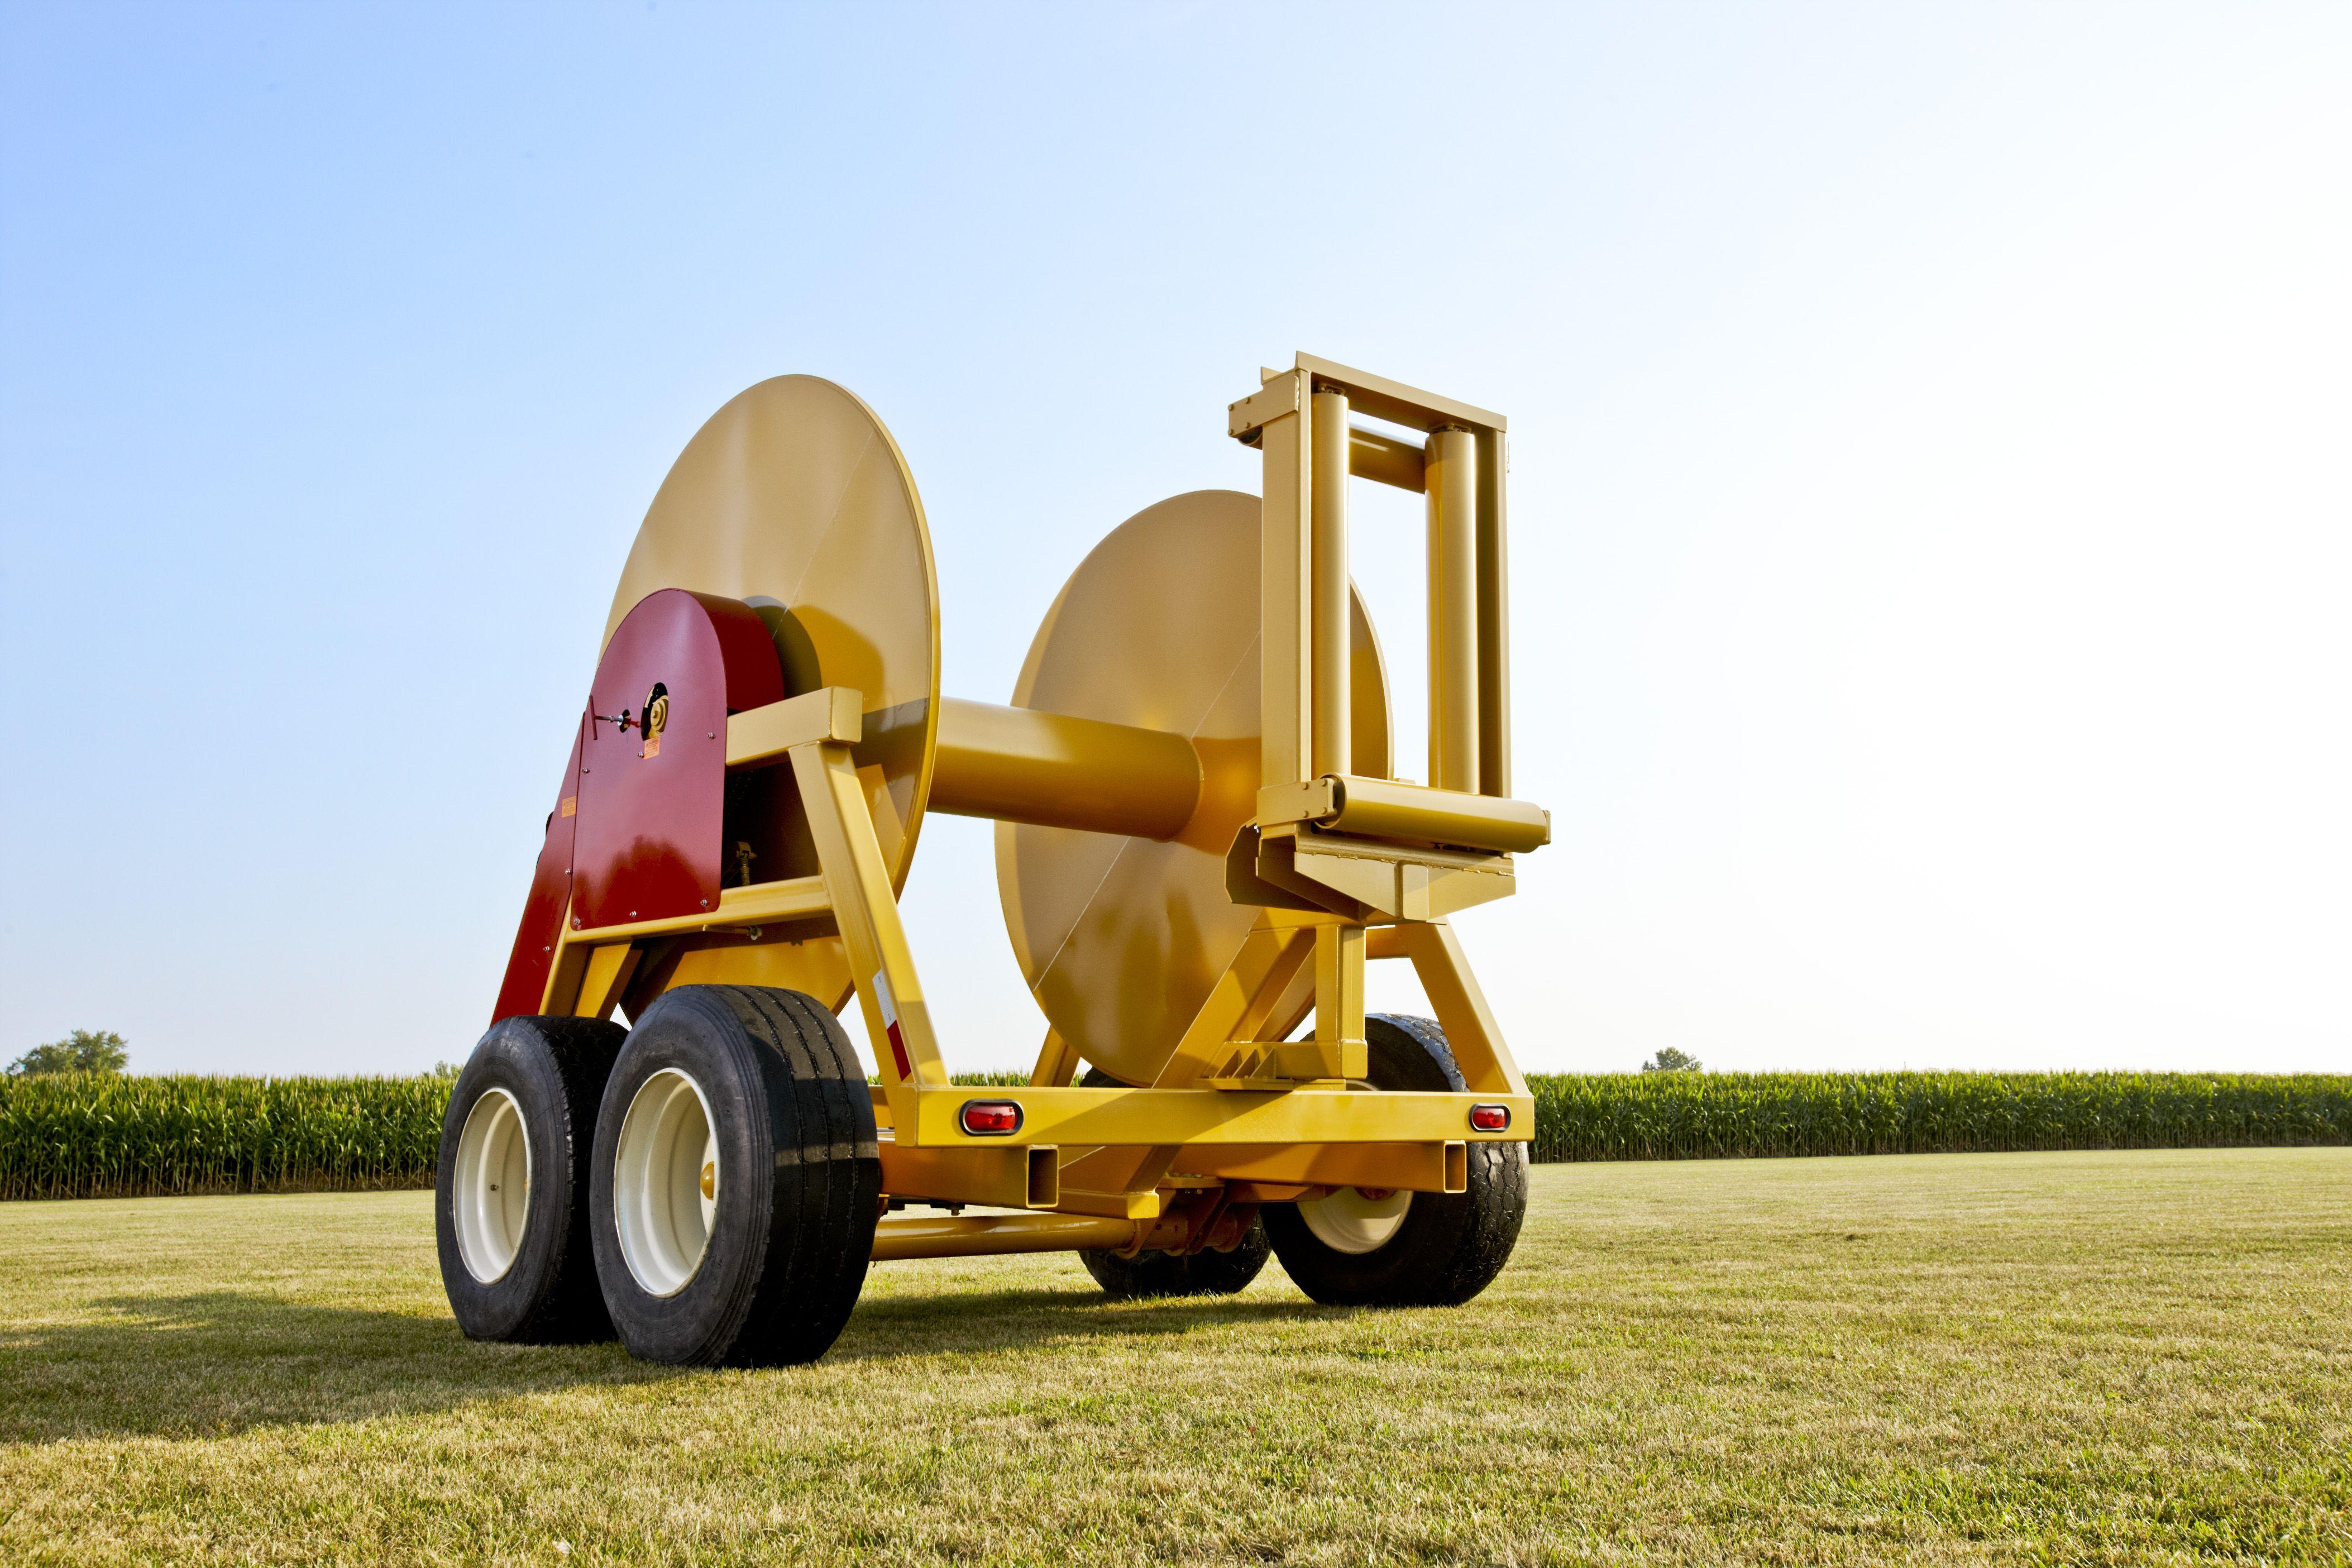 1408 Hose Reel #FarmEquipment #Manure | Manure Handling